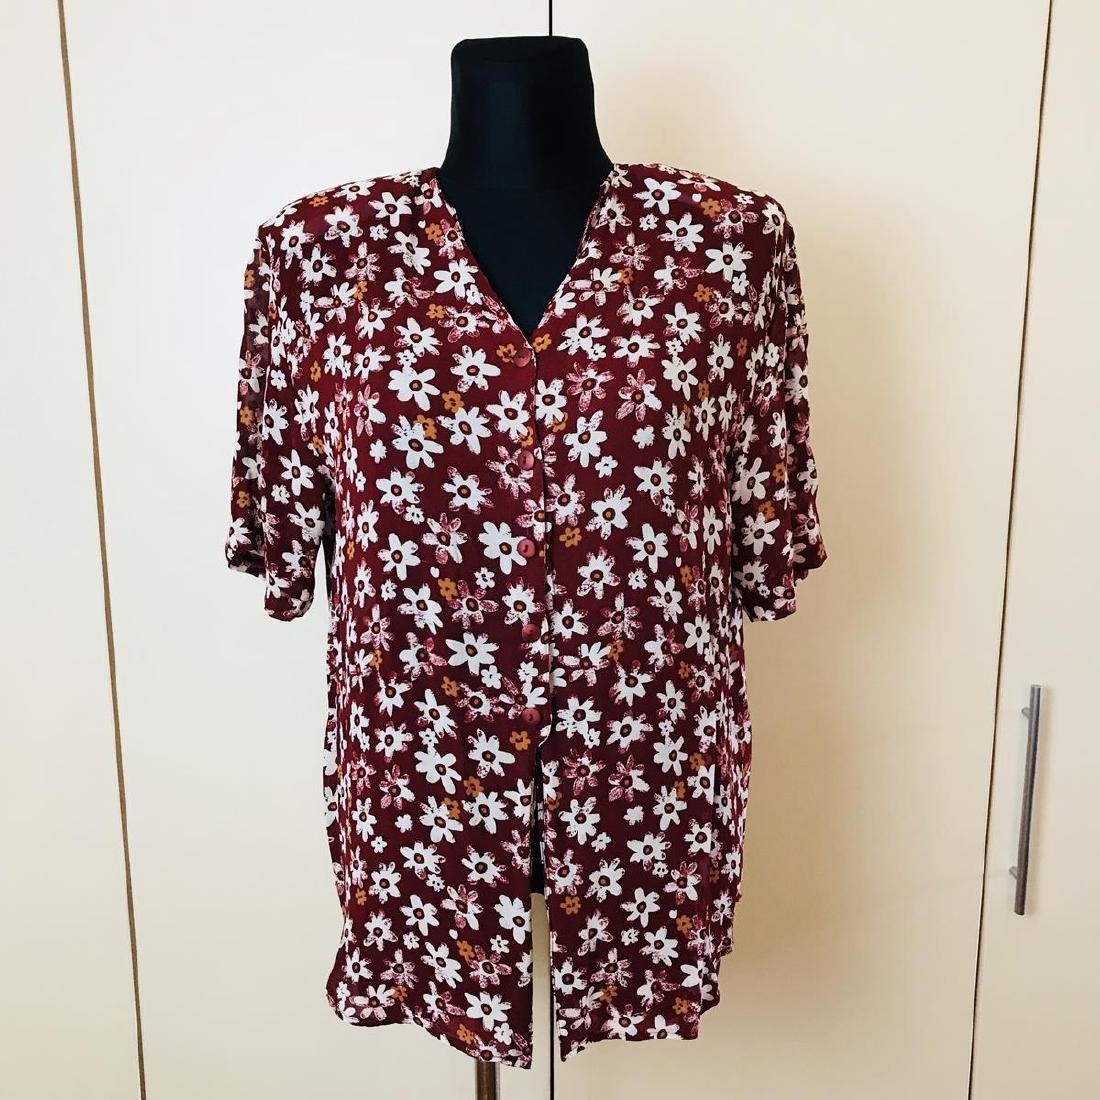 Vintage Women's Bellissima Designer Blouse Shirt Top